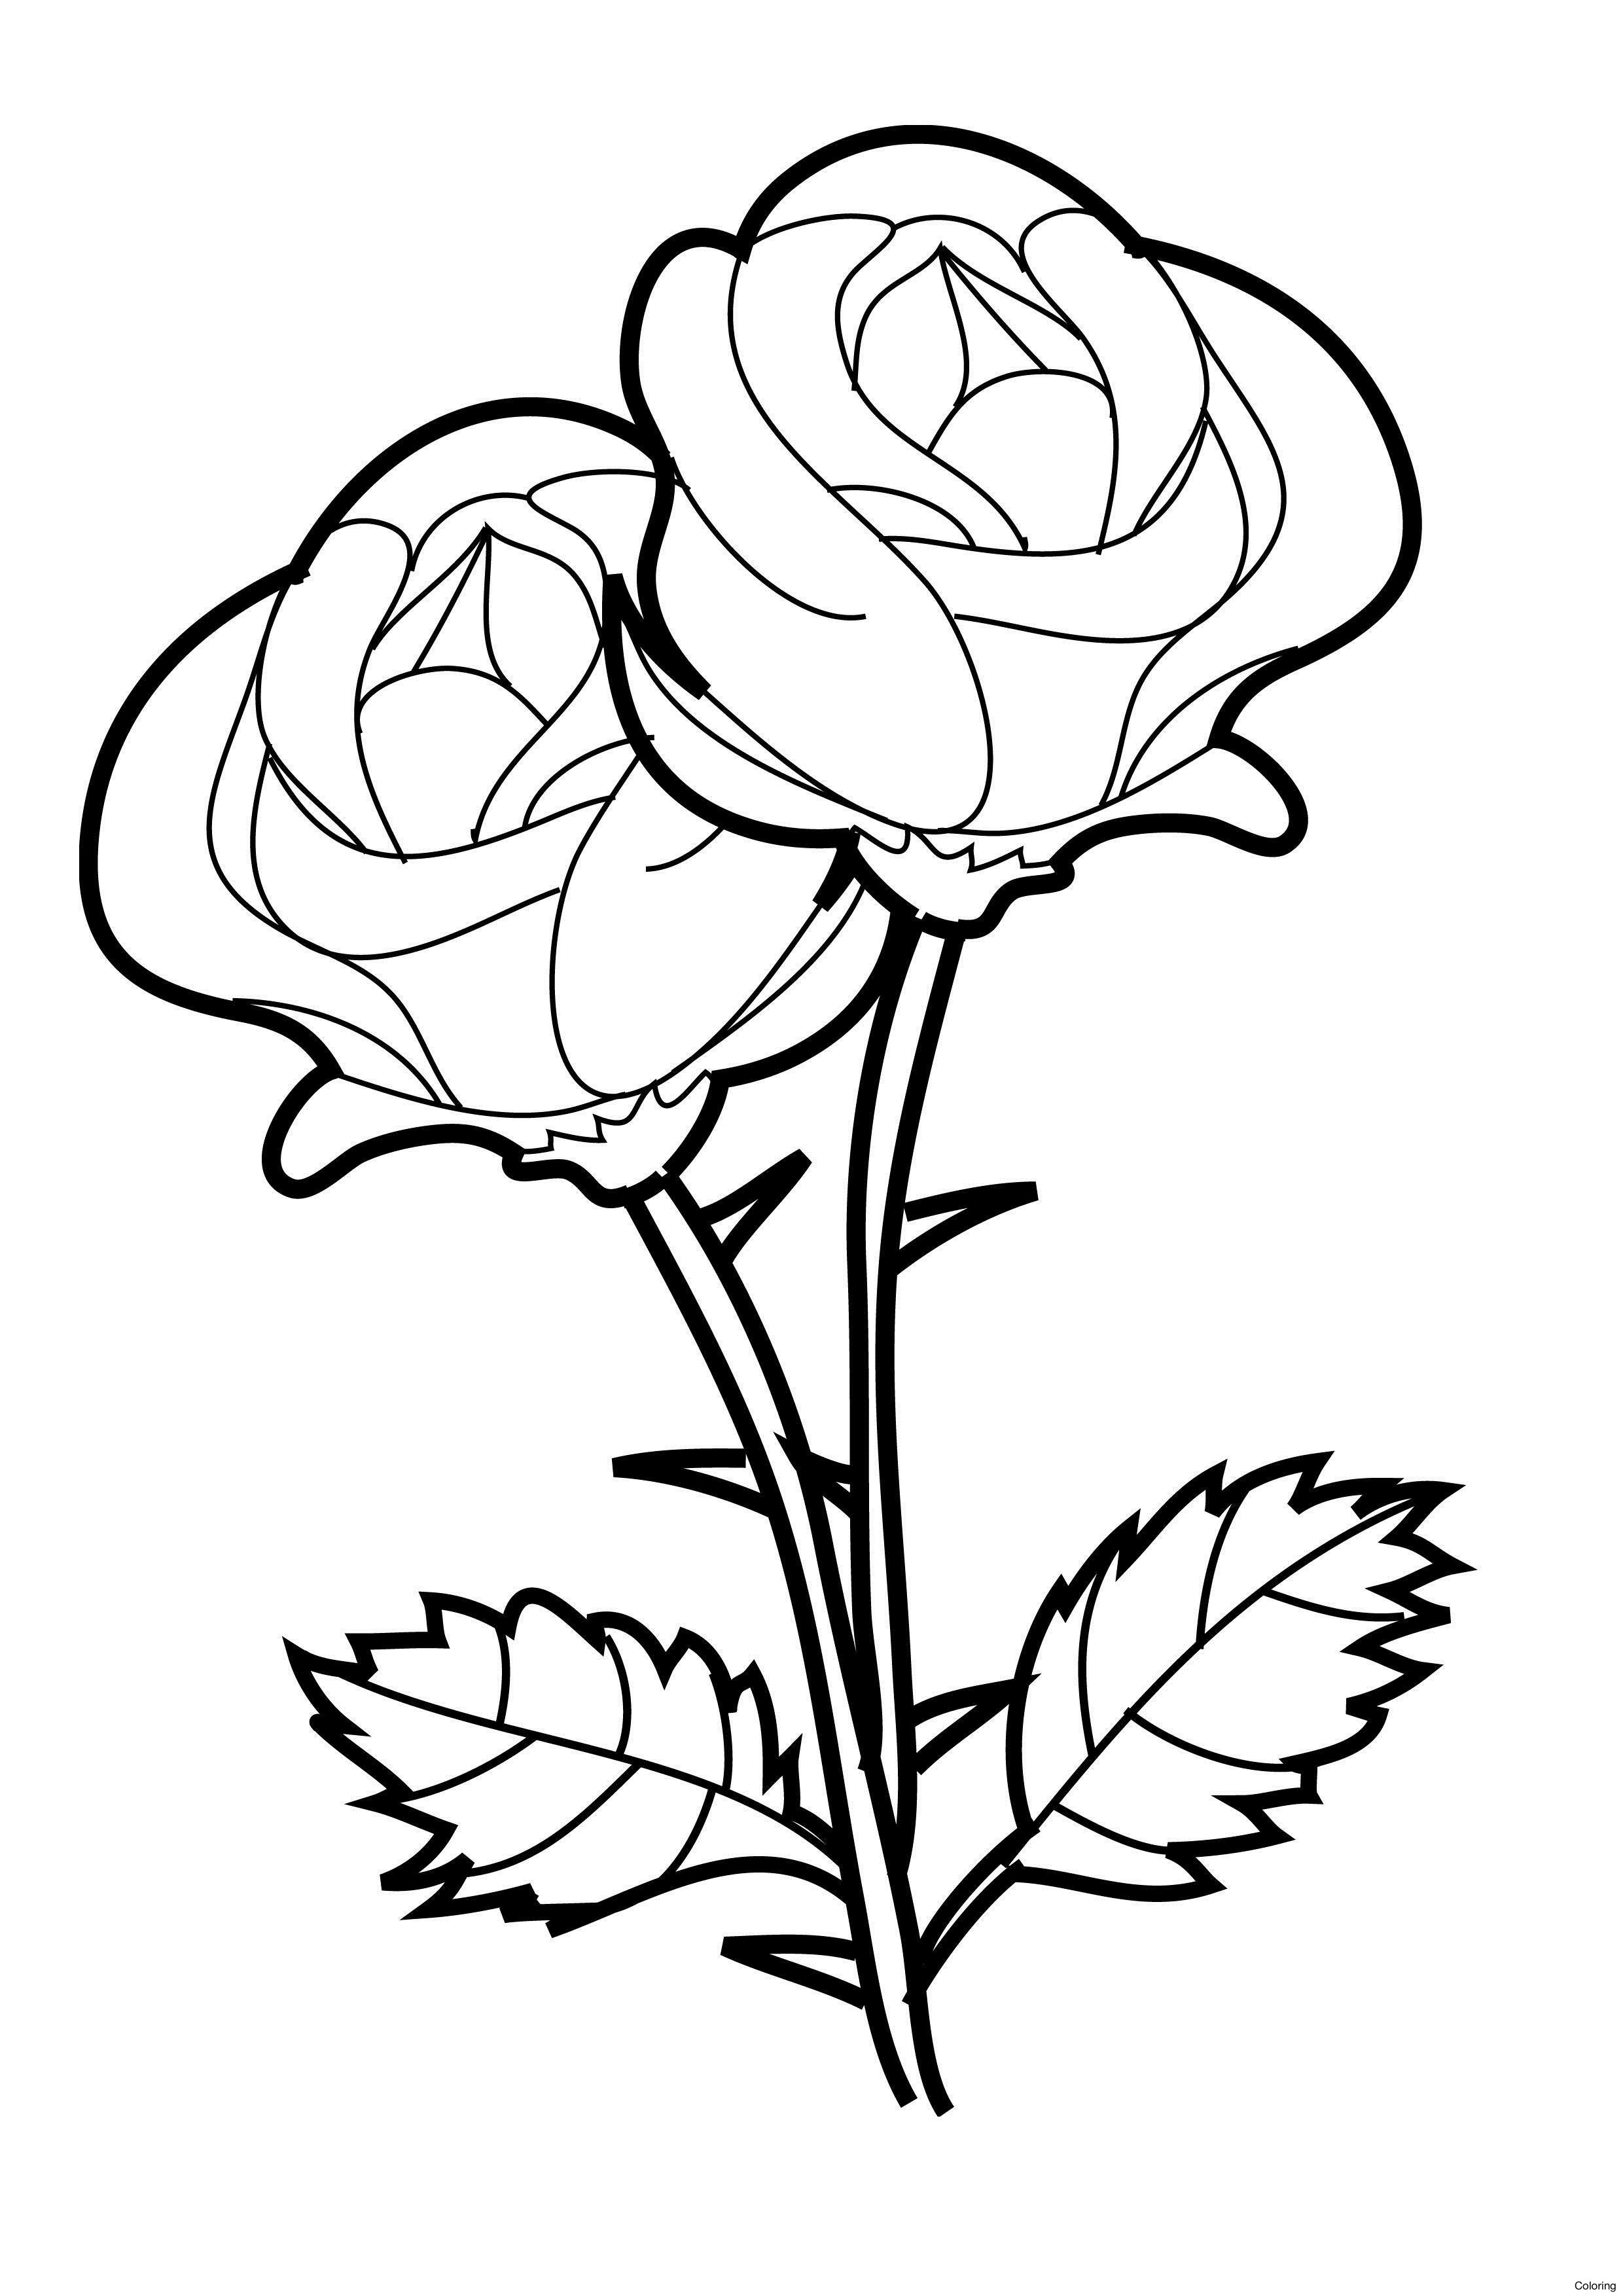 2480x3508 rose flower drawing images easy rose drawing for kids rose flower